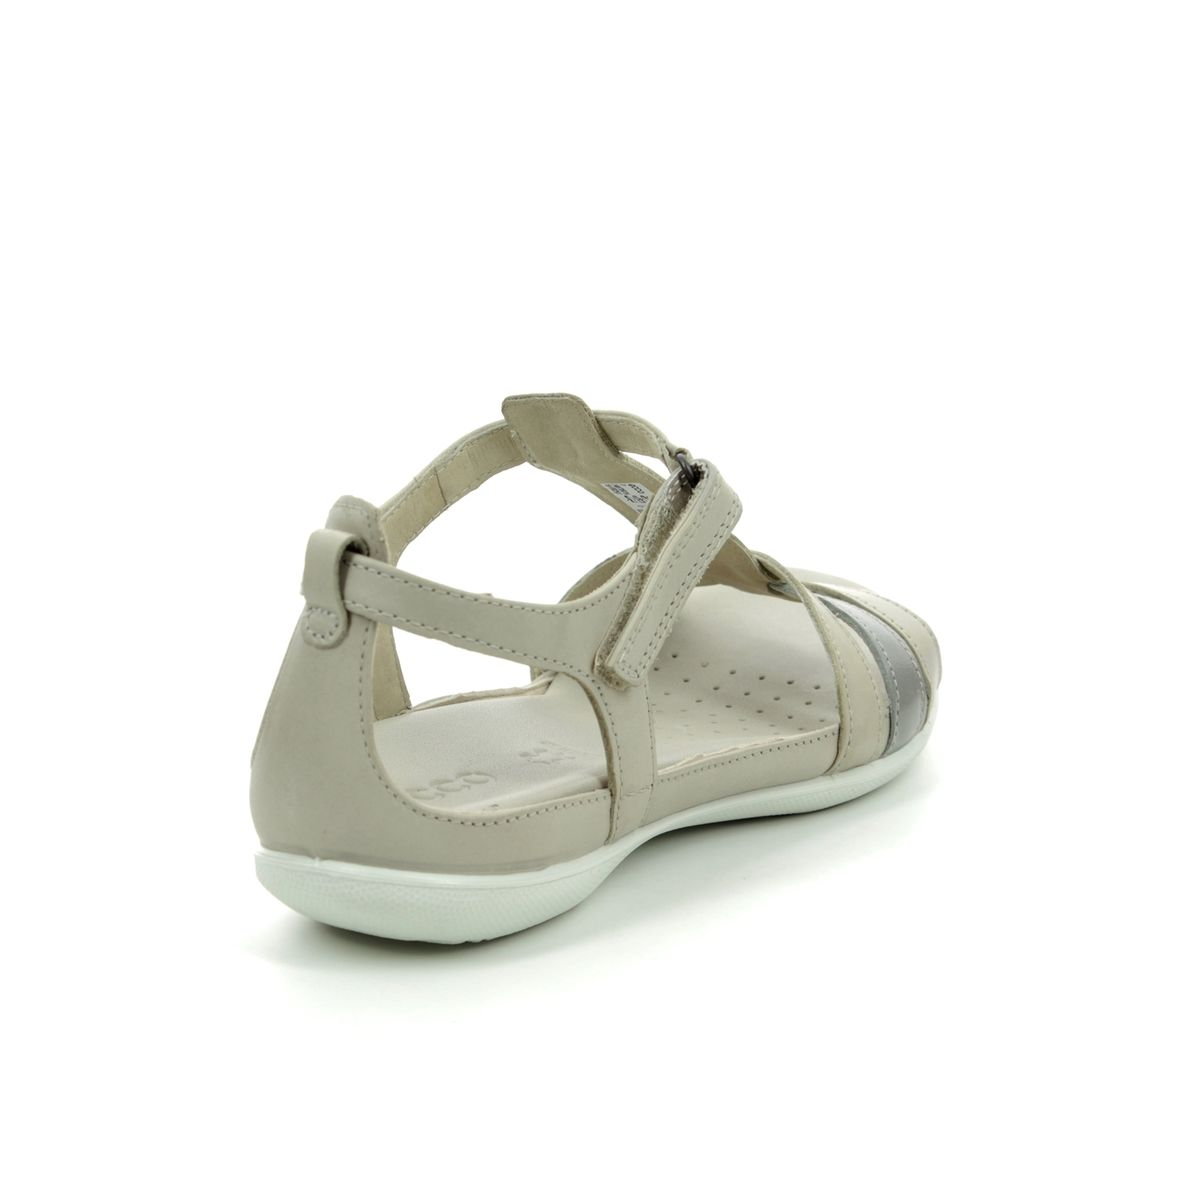 0a326ccc1b44 ECCO Sandals - Beige multi - 240873 59759 FLASH TBAR